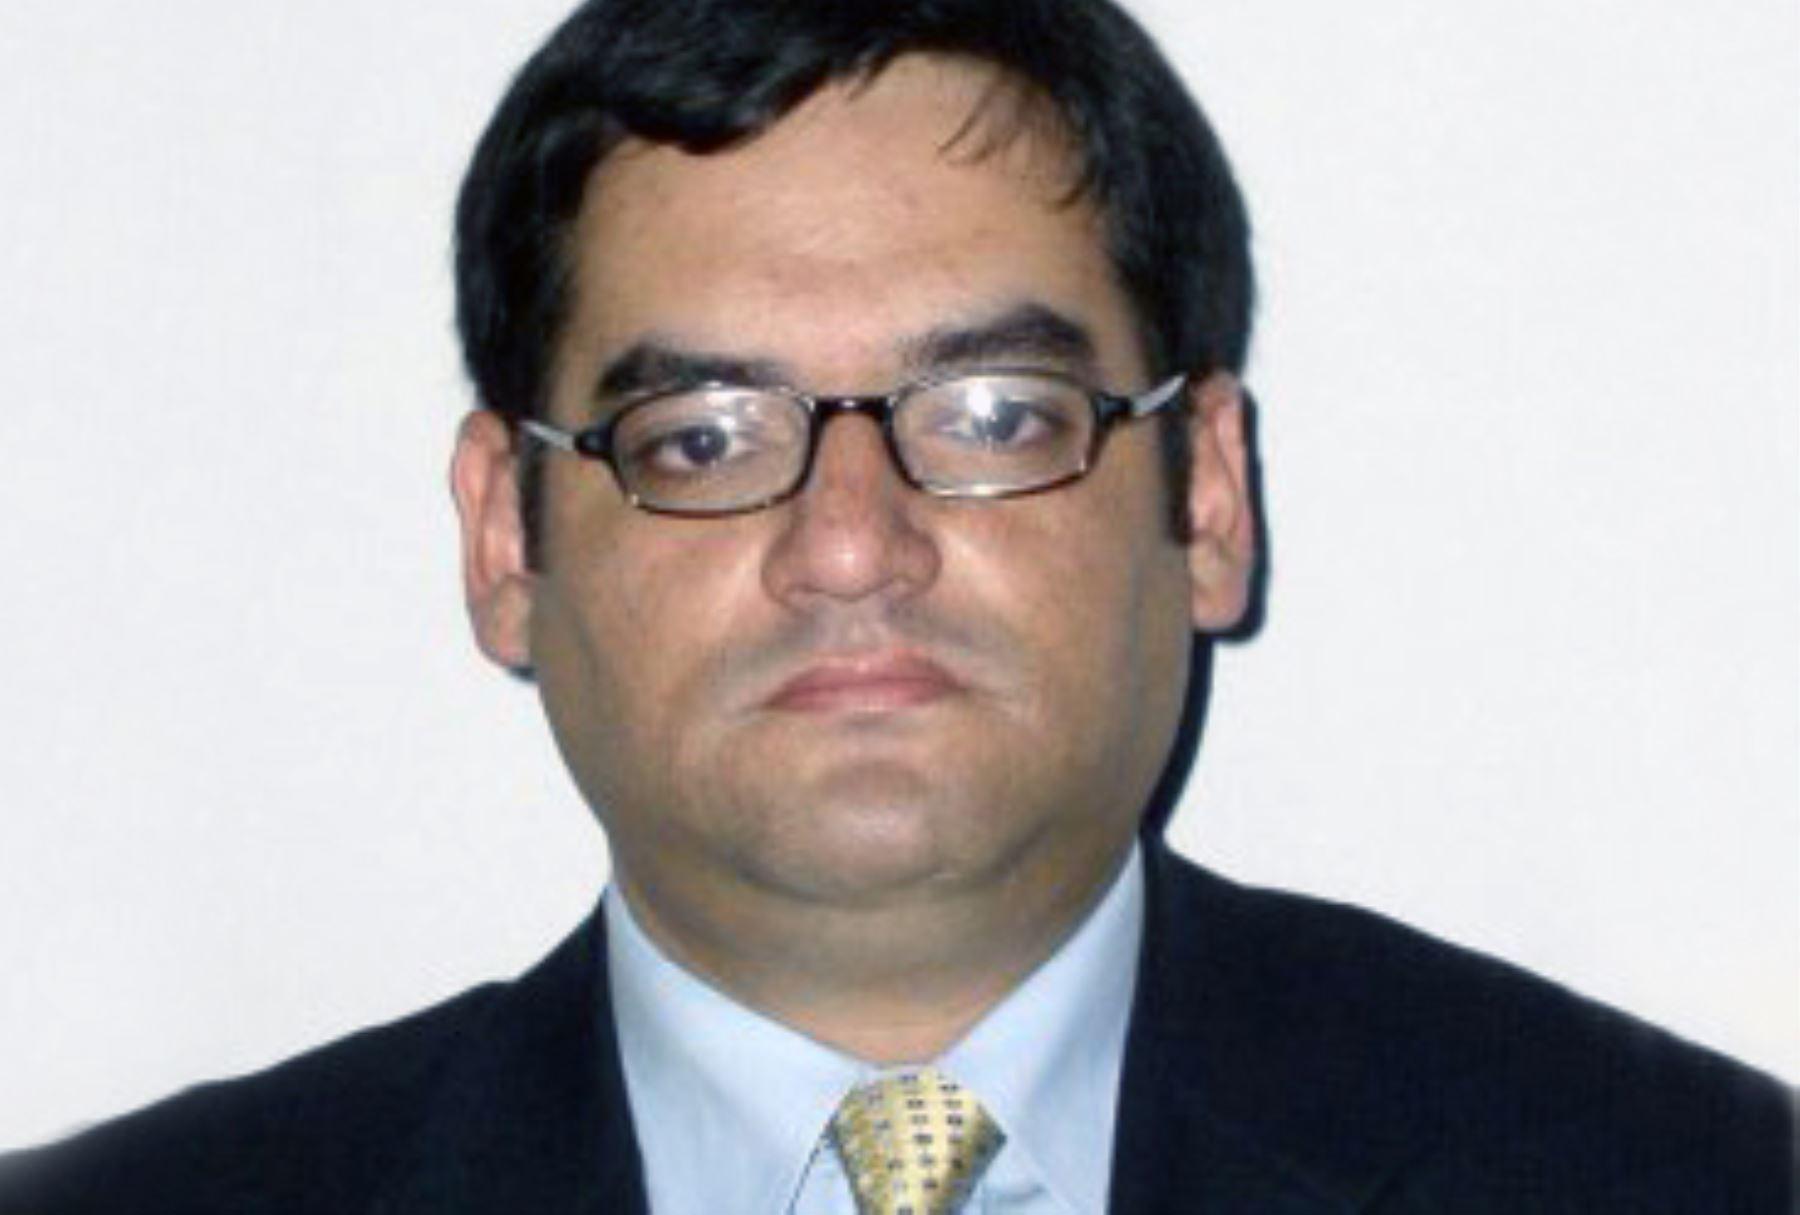 Procurador antiterrorismo Milko Ruiz. ANDINA/Difusión